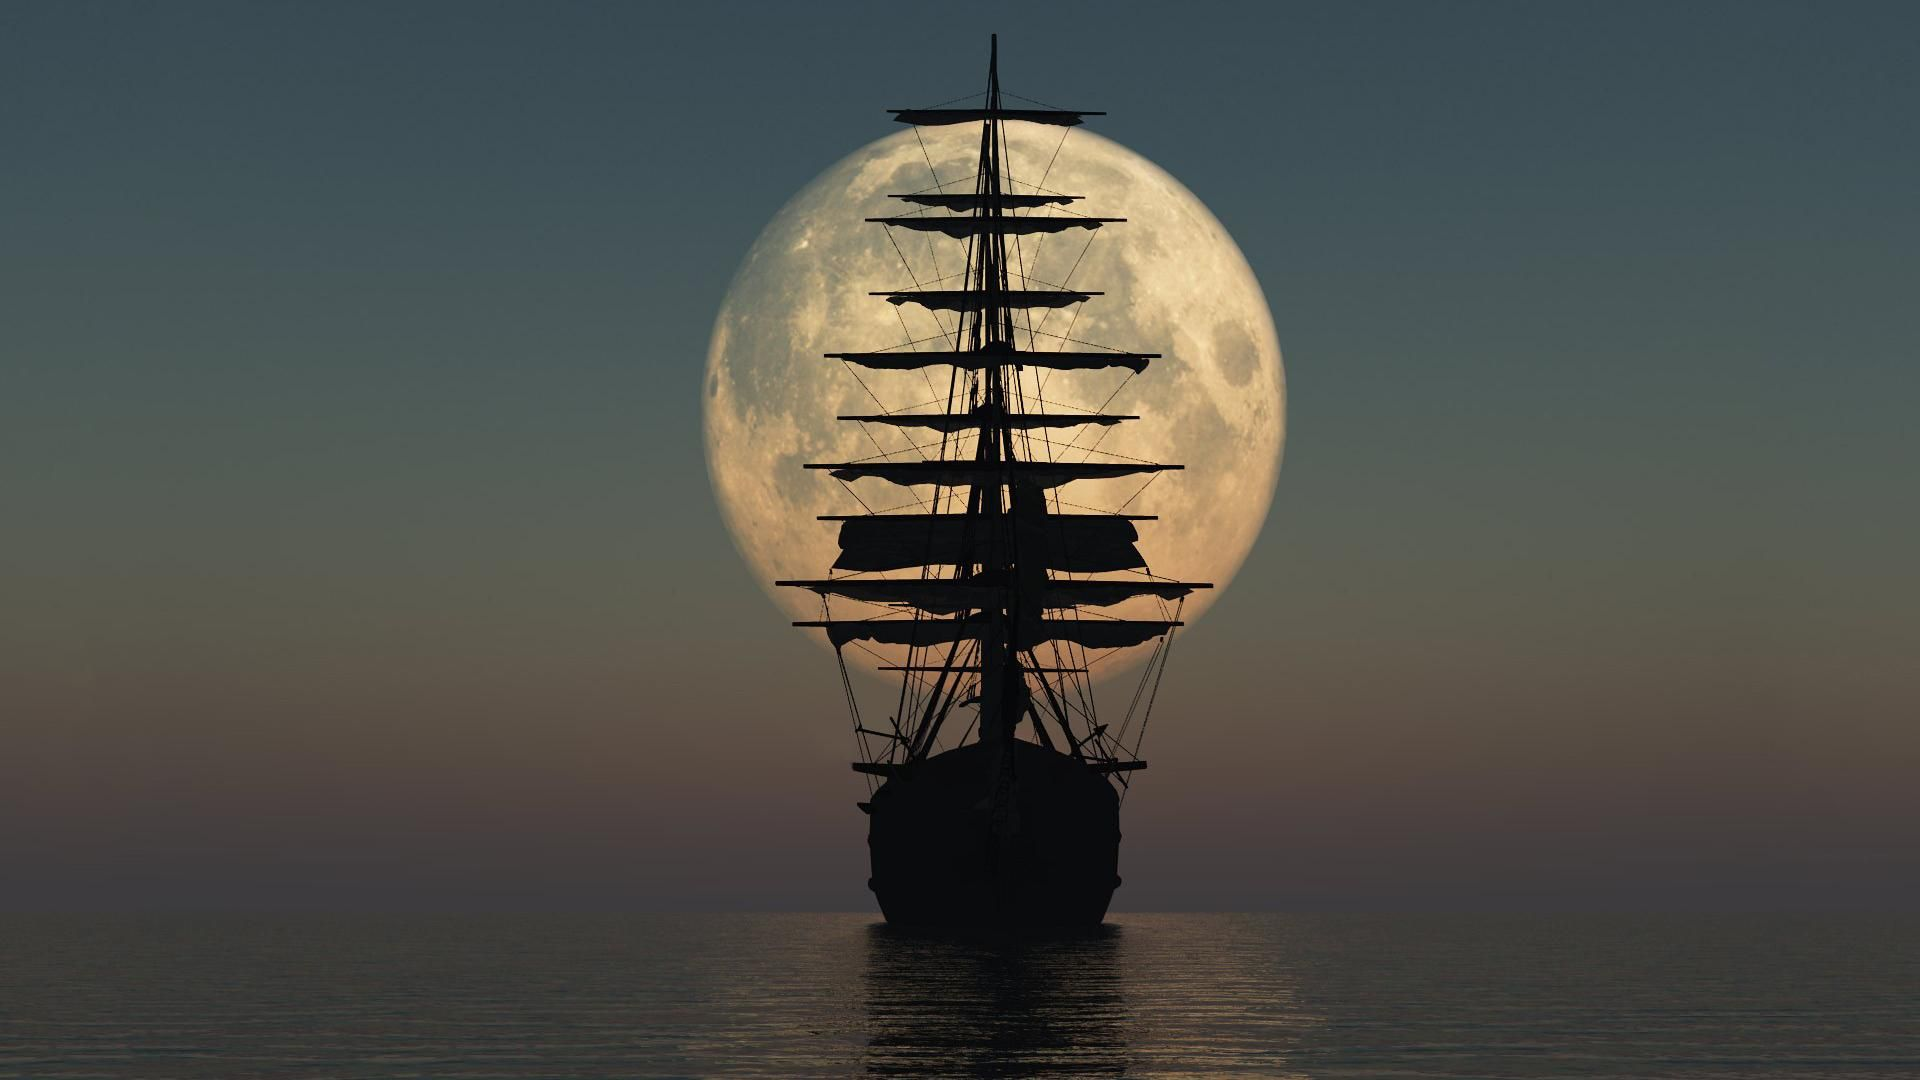 Black Pearl Ship Pirate Silhouette Hd Wallpaper Album On Imgur